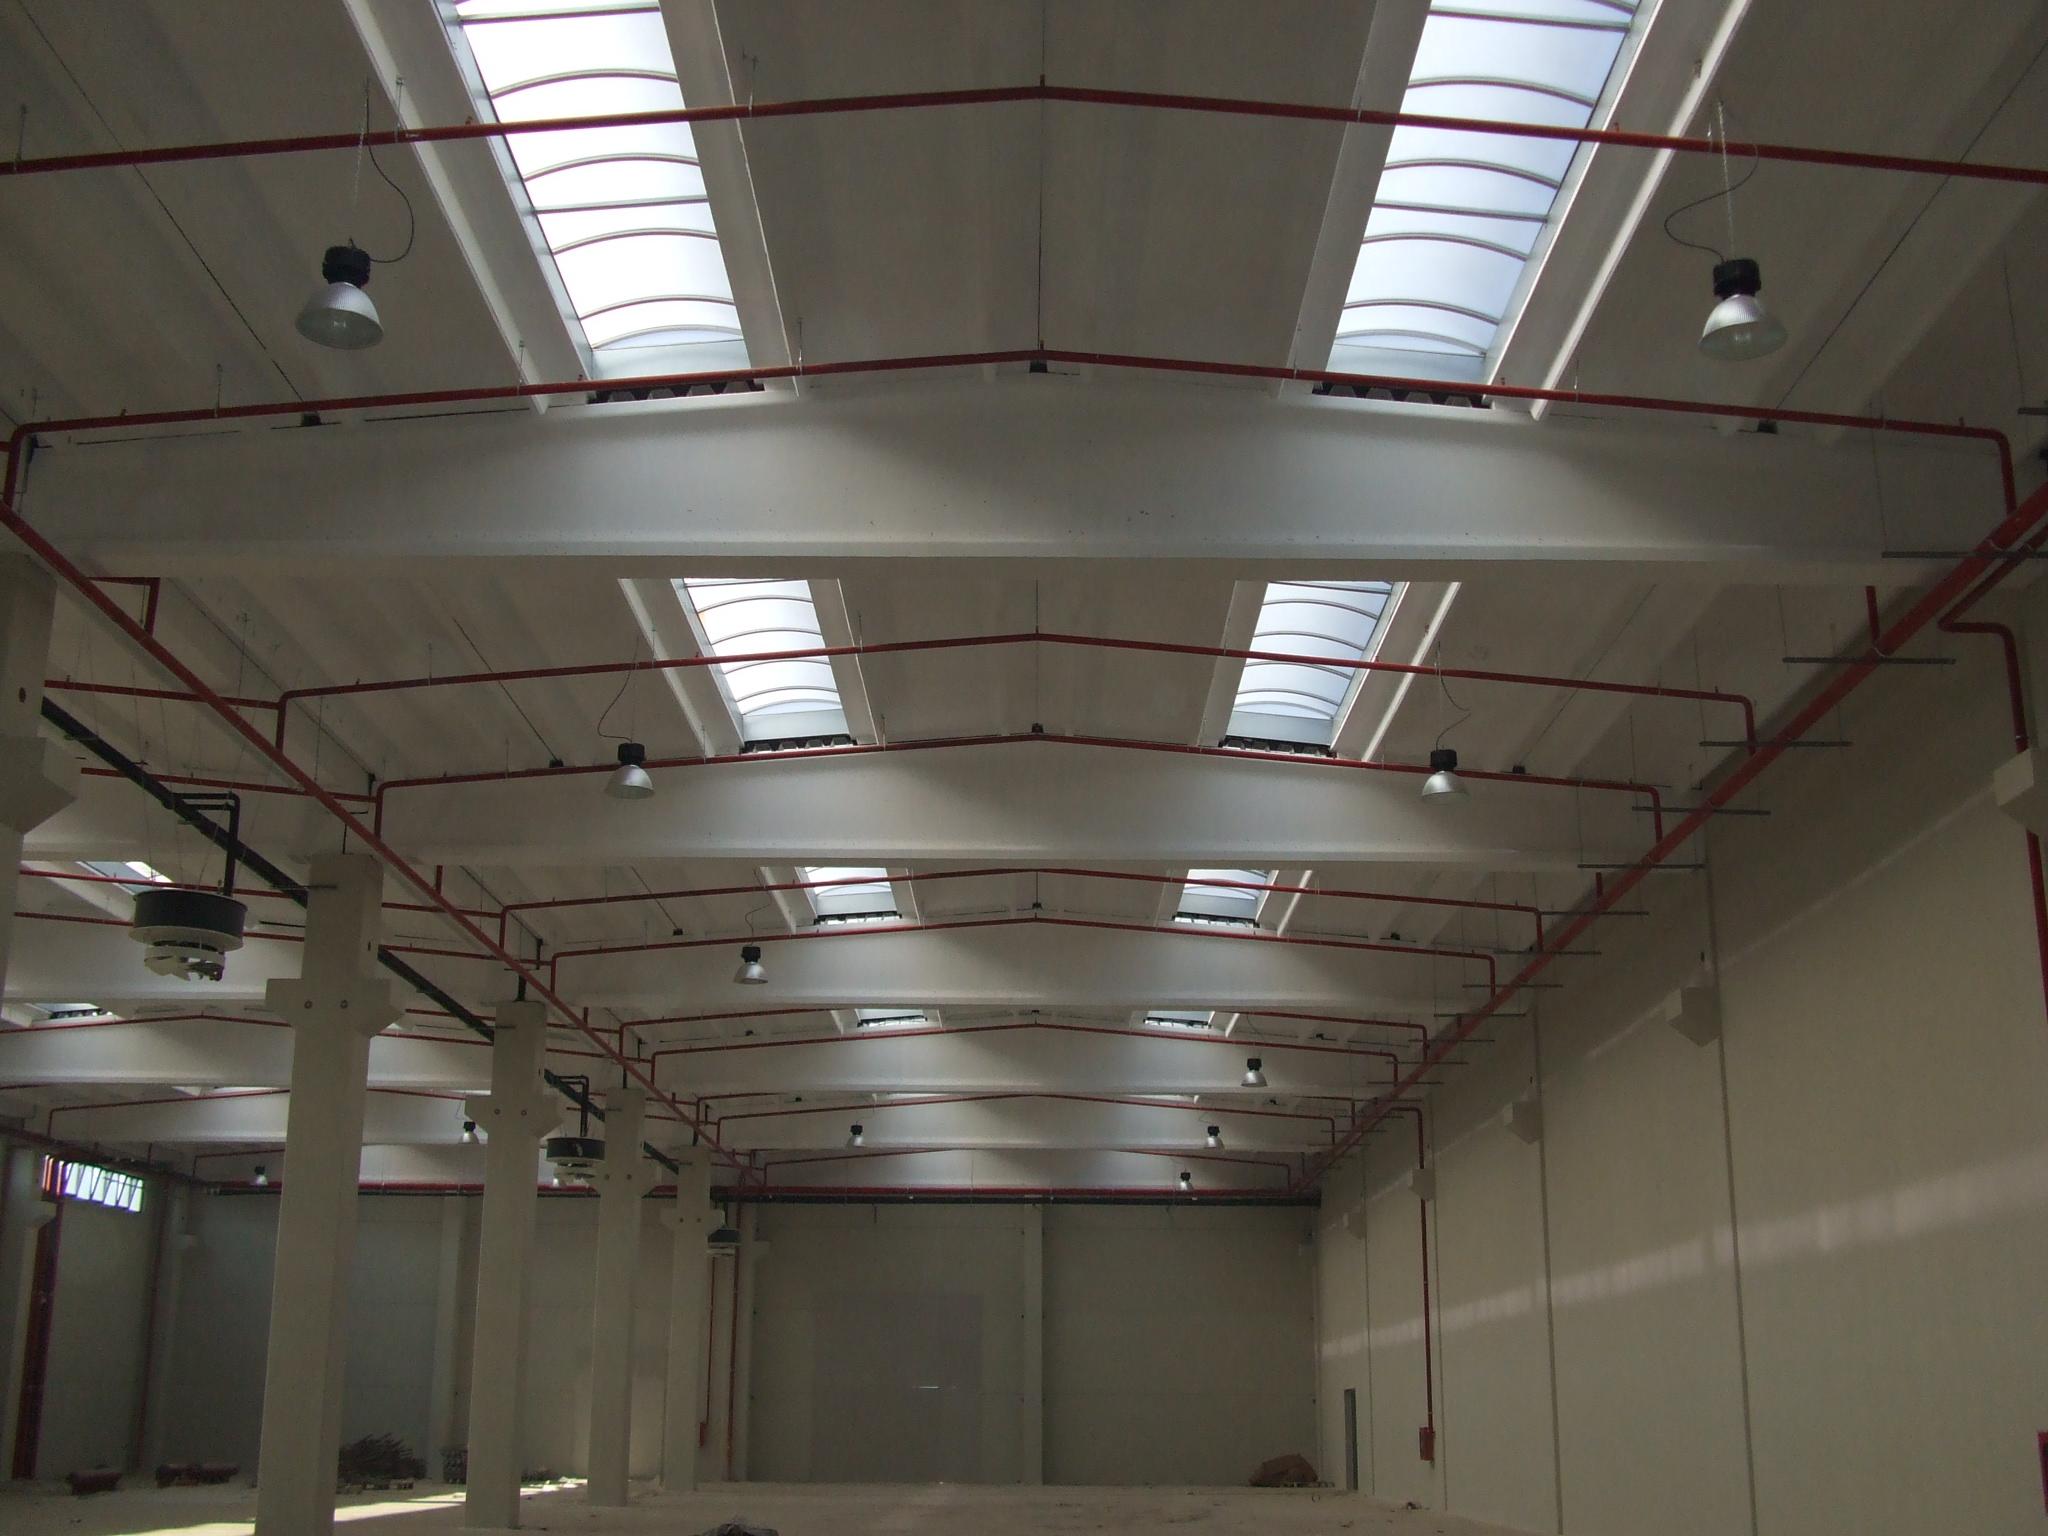 Hale industriale cu elemente structurale prefabricate din beton armat MAGNETTI - Poza 3